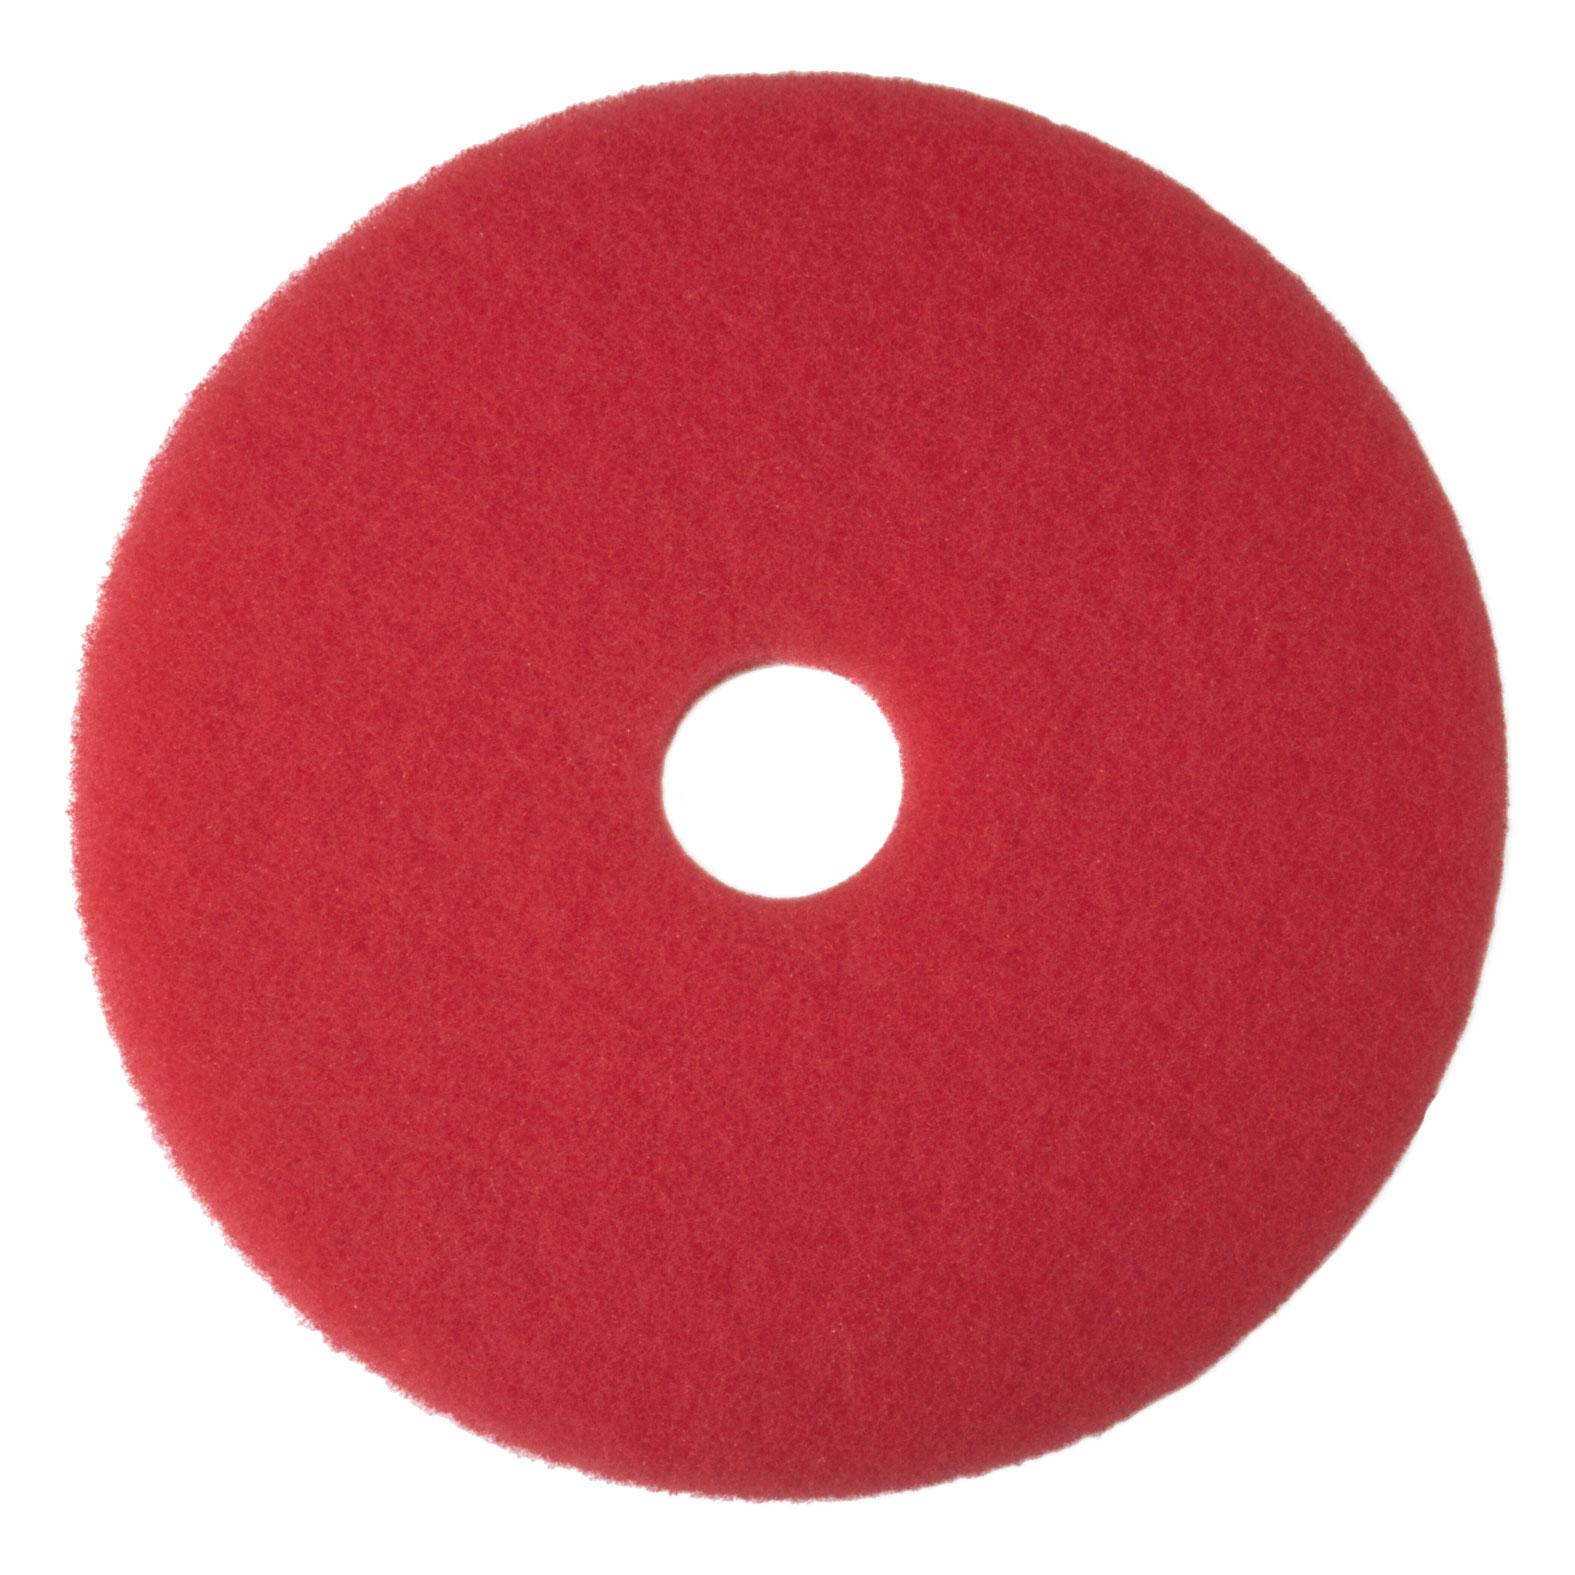 PAD červený 254 mm / 10